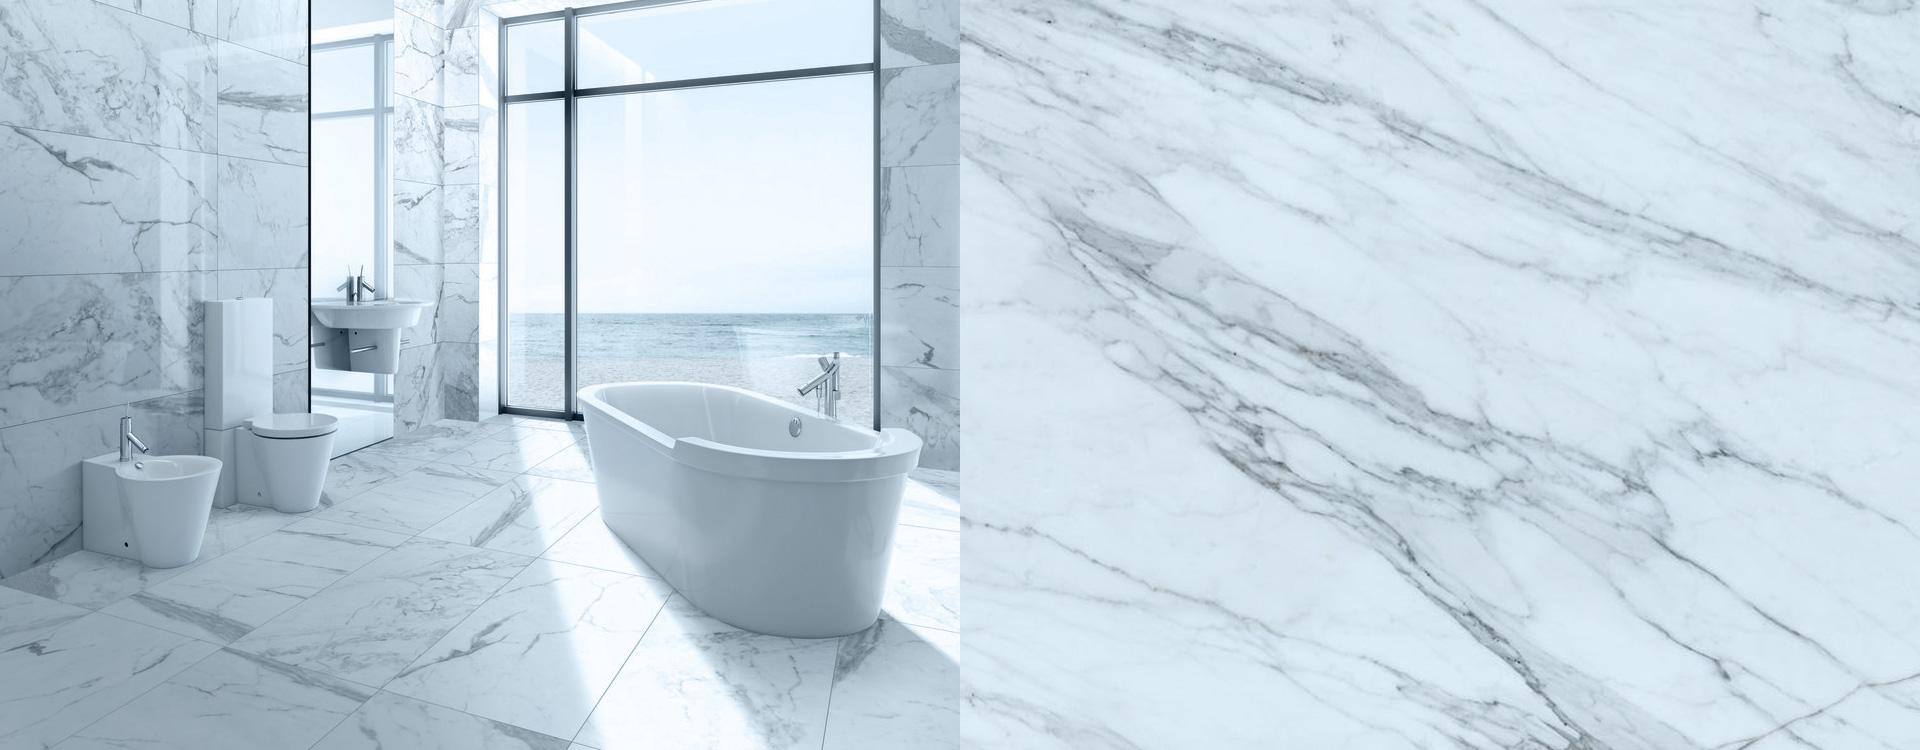 Bathroom Tile Store